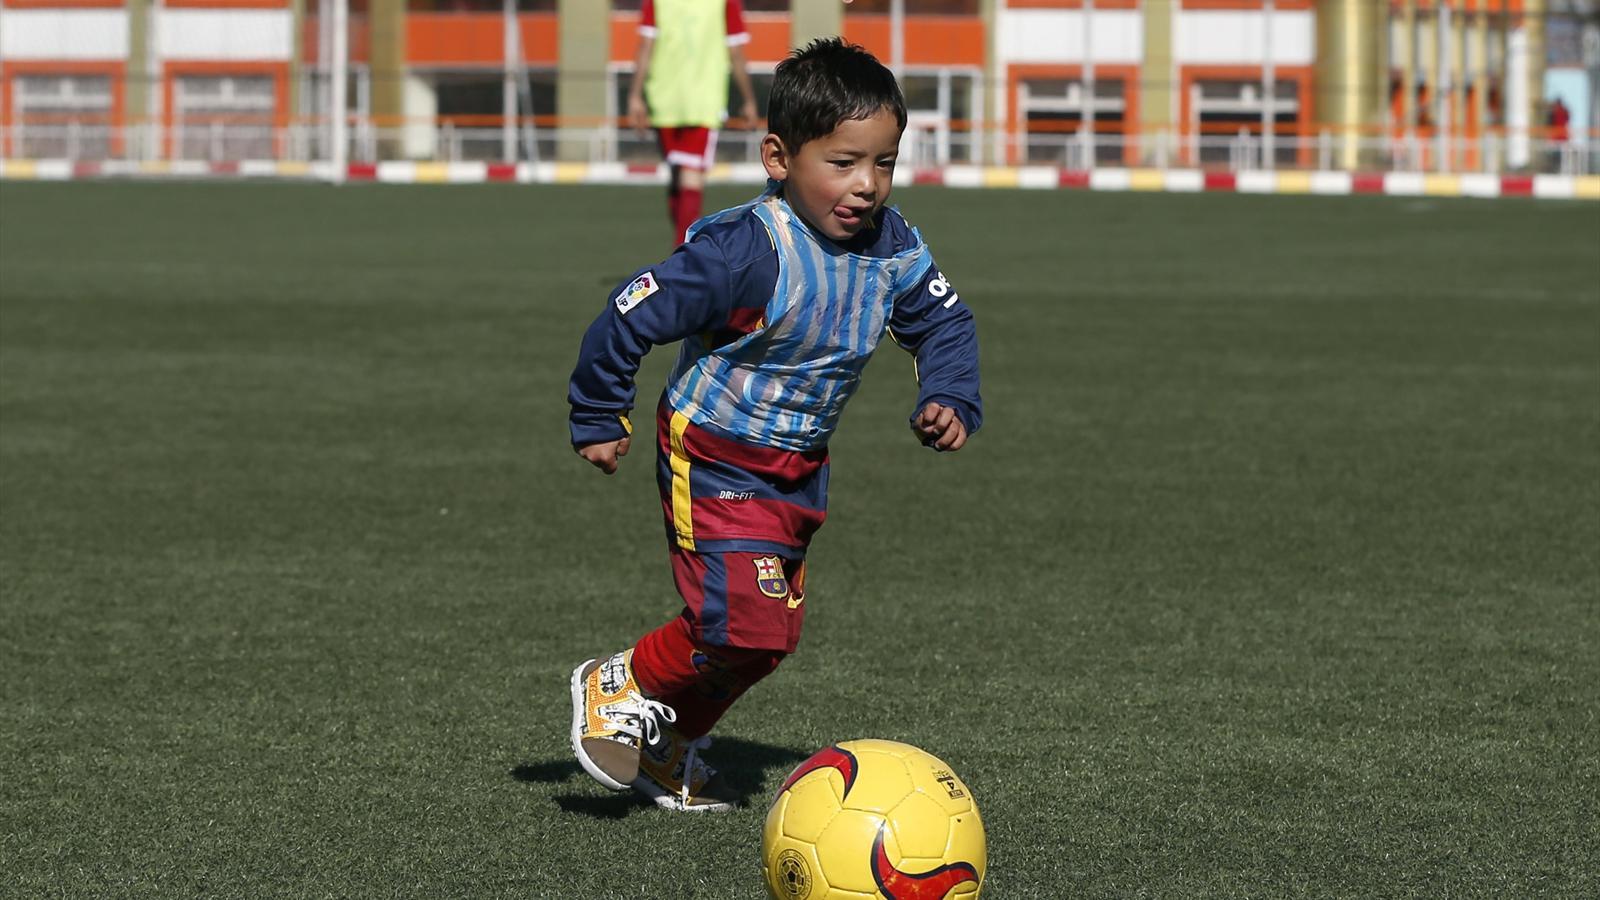 Murtaza Ahmadi, 'Lionel Messi's biggest fan'